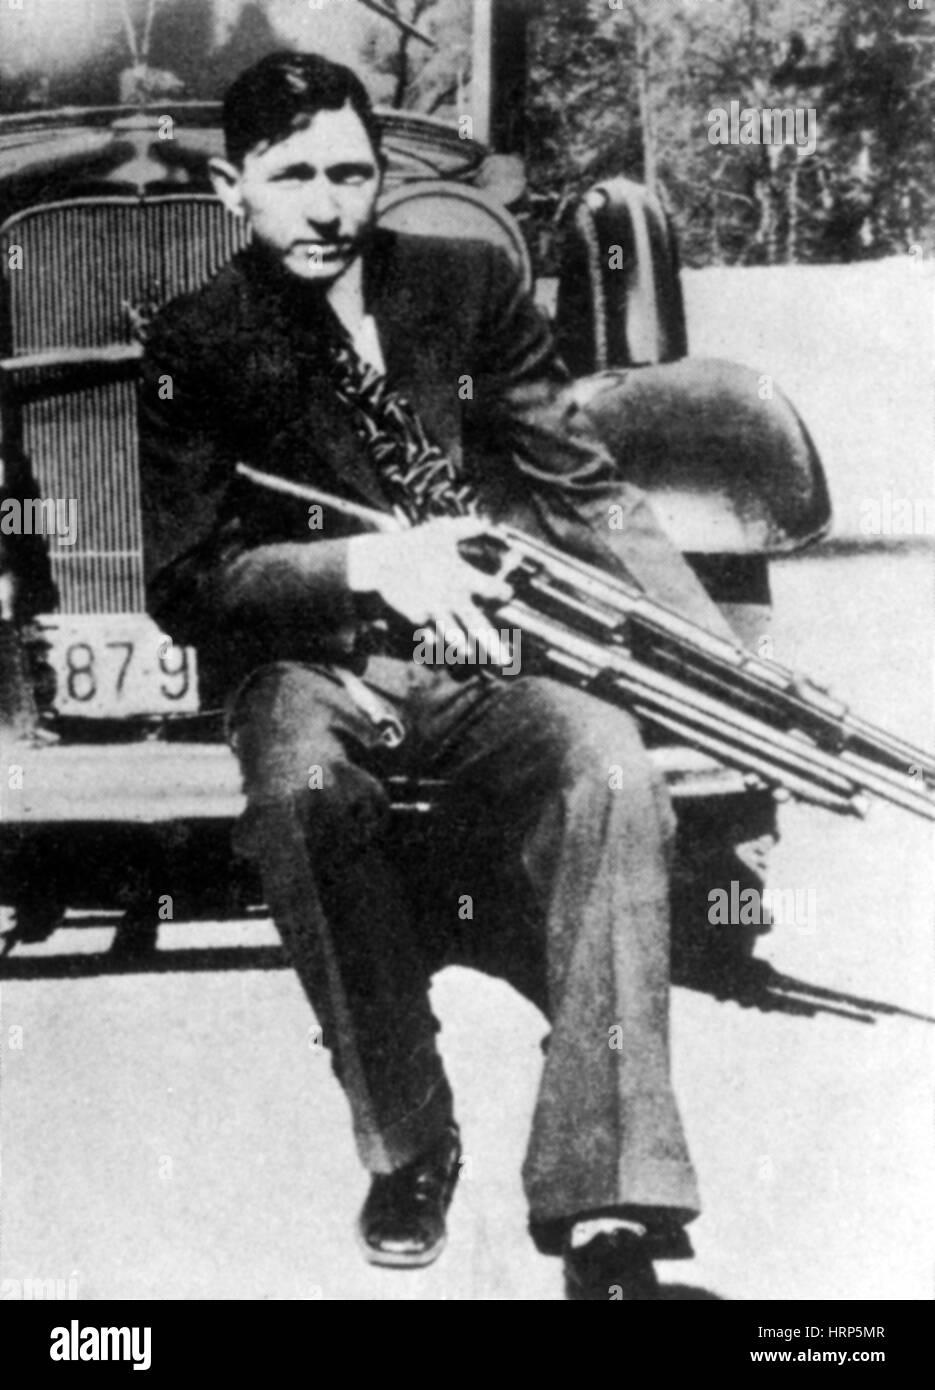 Clyde Barrow, American Criminal - Stock Image